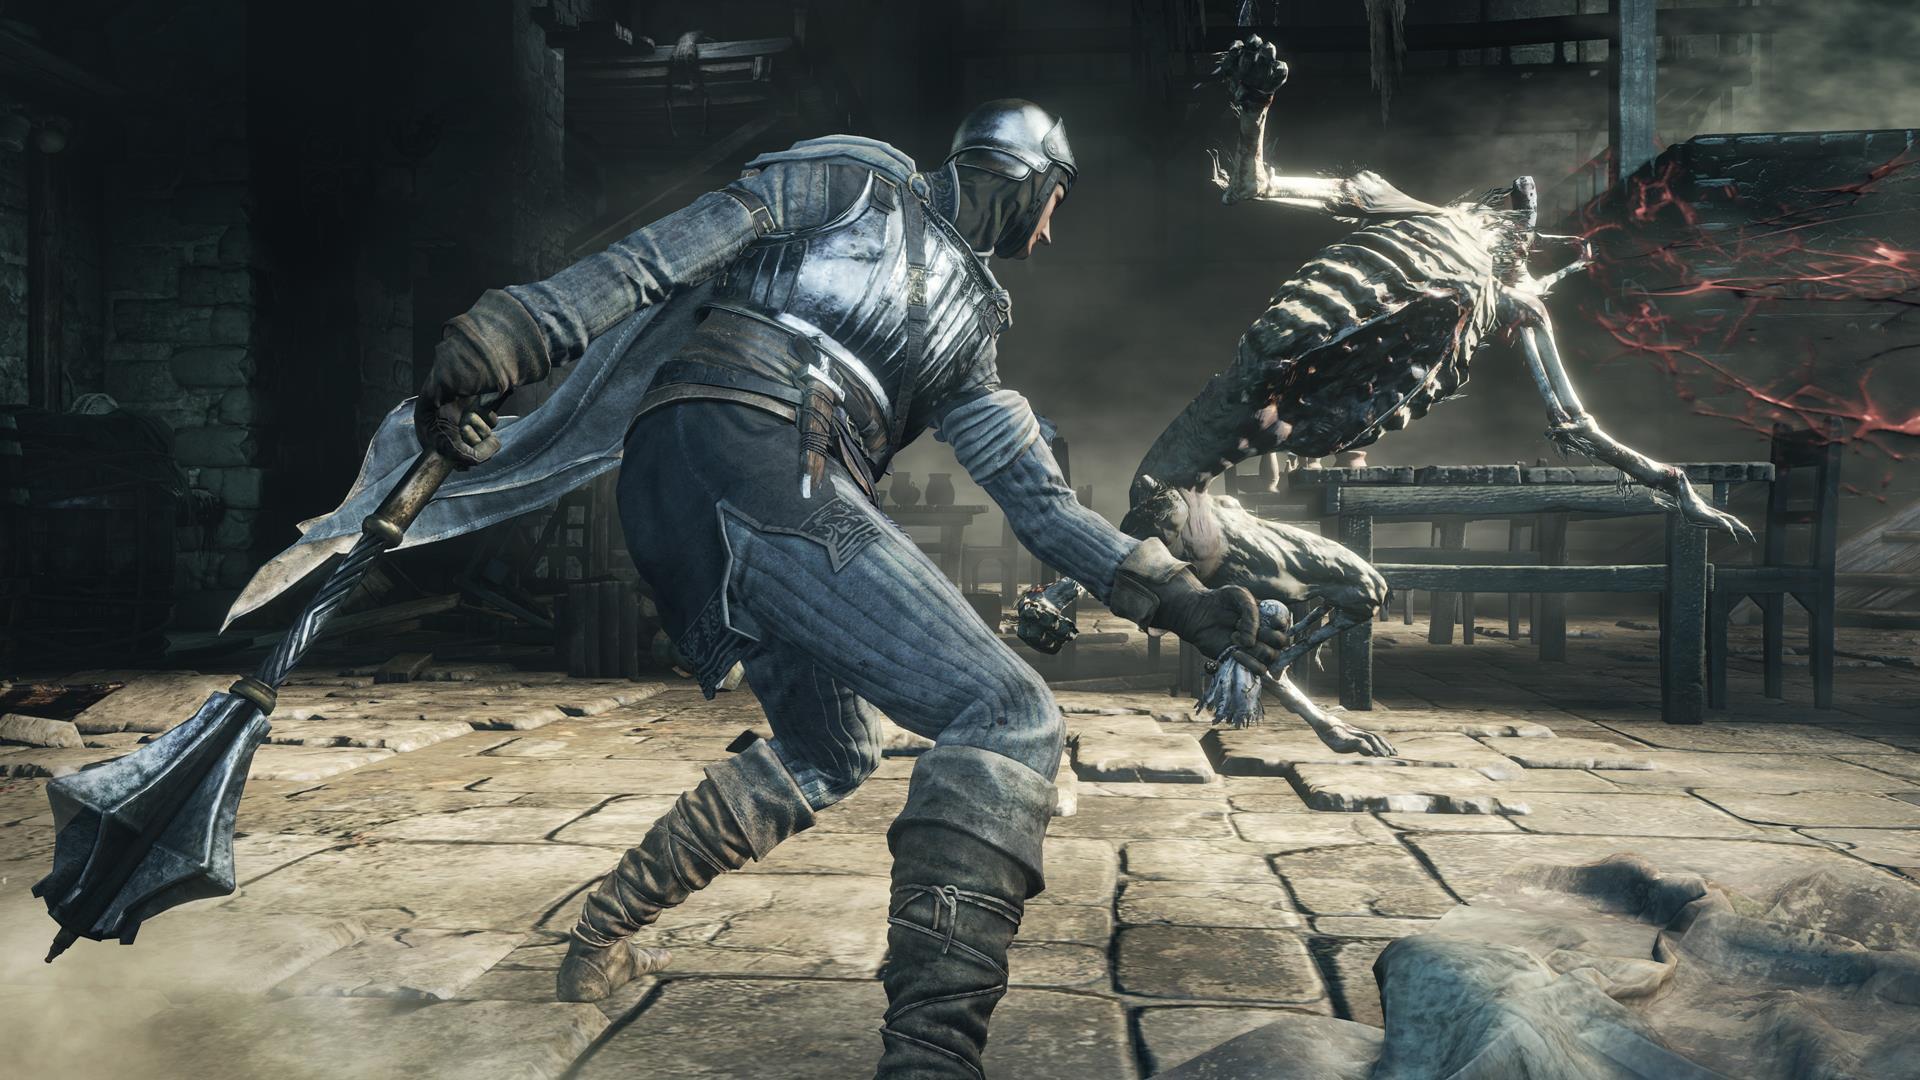 New Dark Souls 3 screens show co-op, spells, miracles